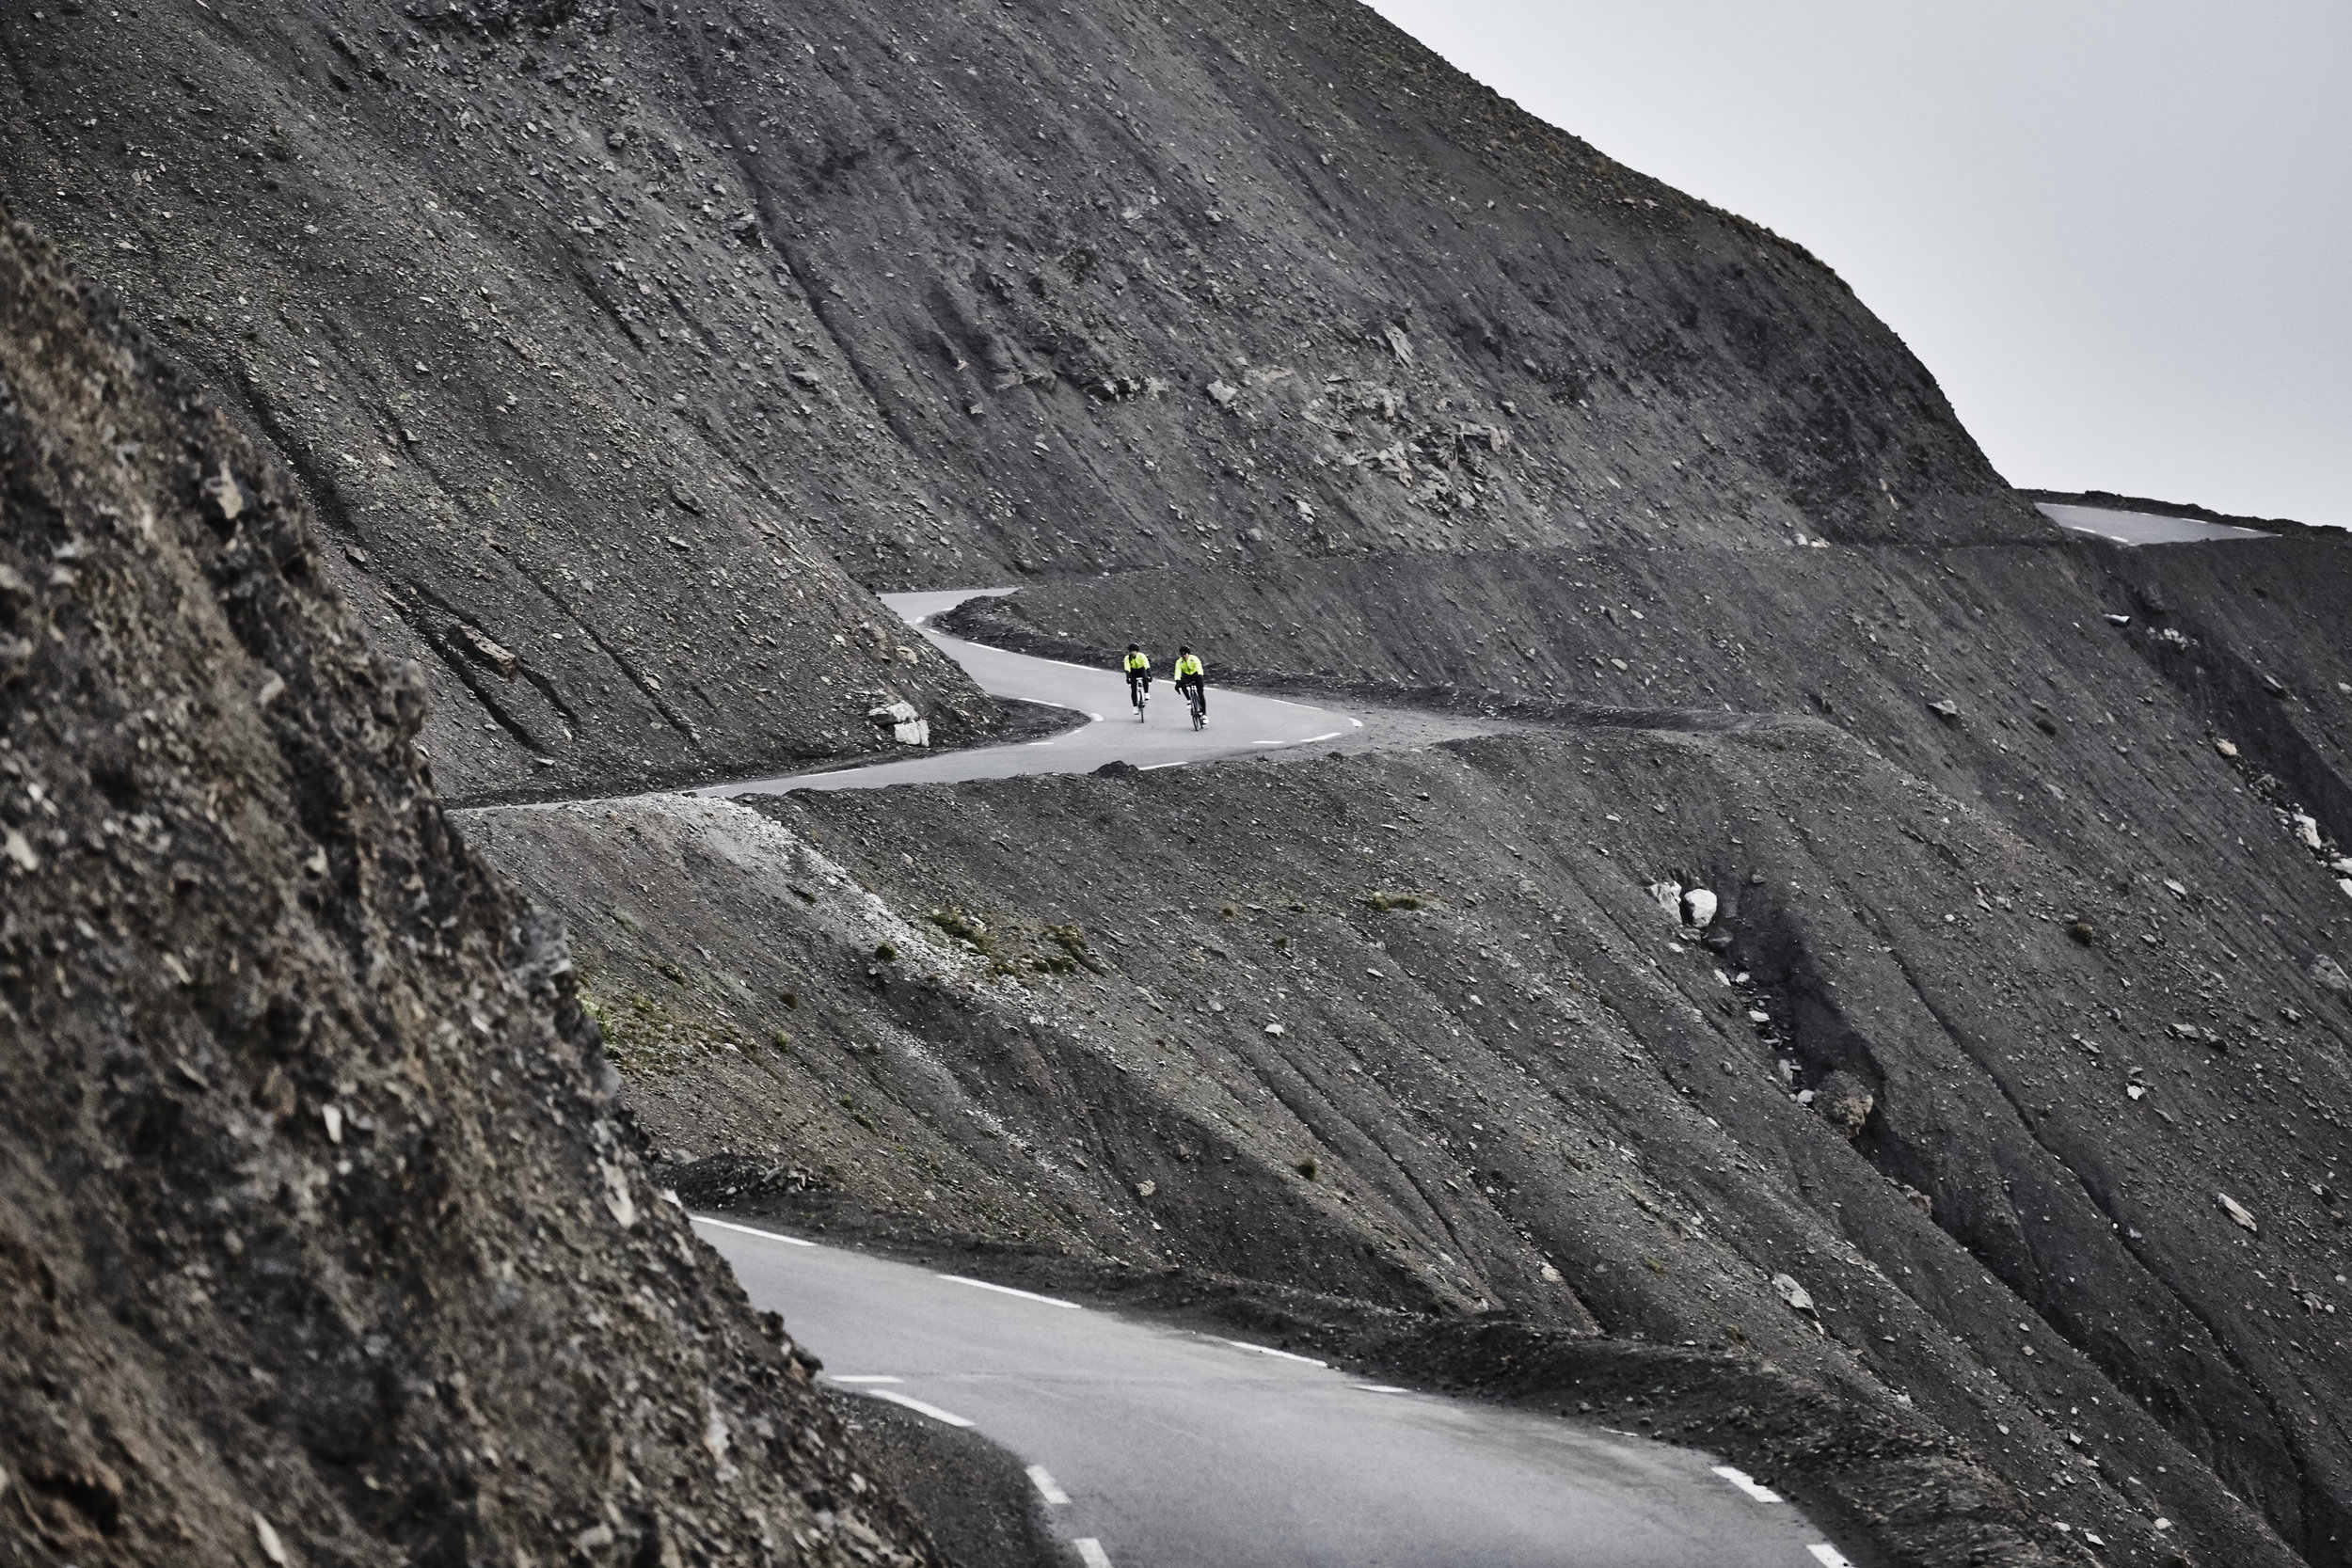 vulpine nick hussey road cycling mountain.jpg